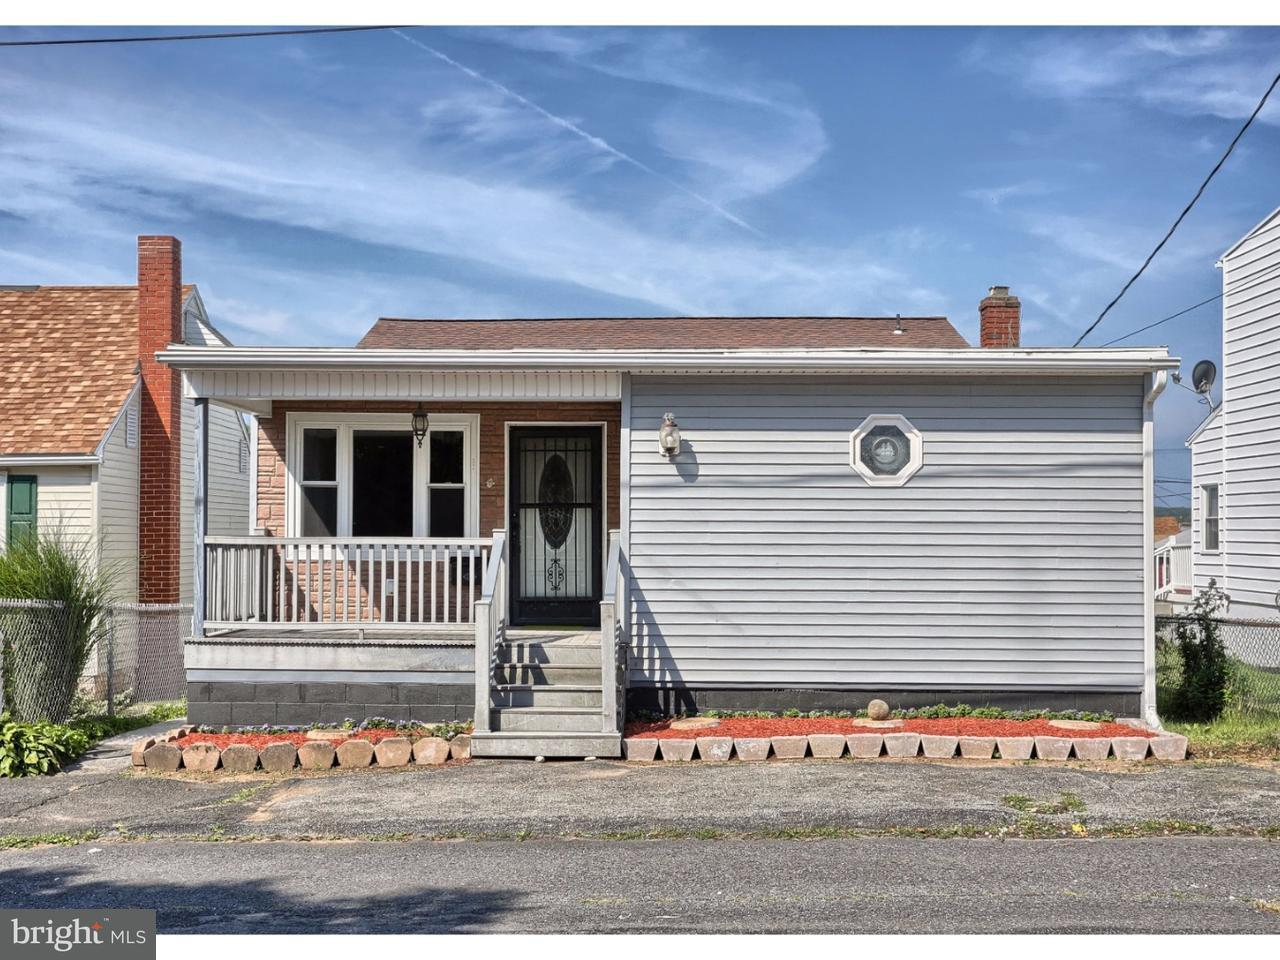 Single Family Home for Sale at 144 S WYLAM Street Frackville, Pennsylvania 17931 United States